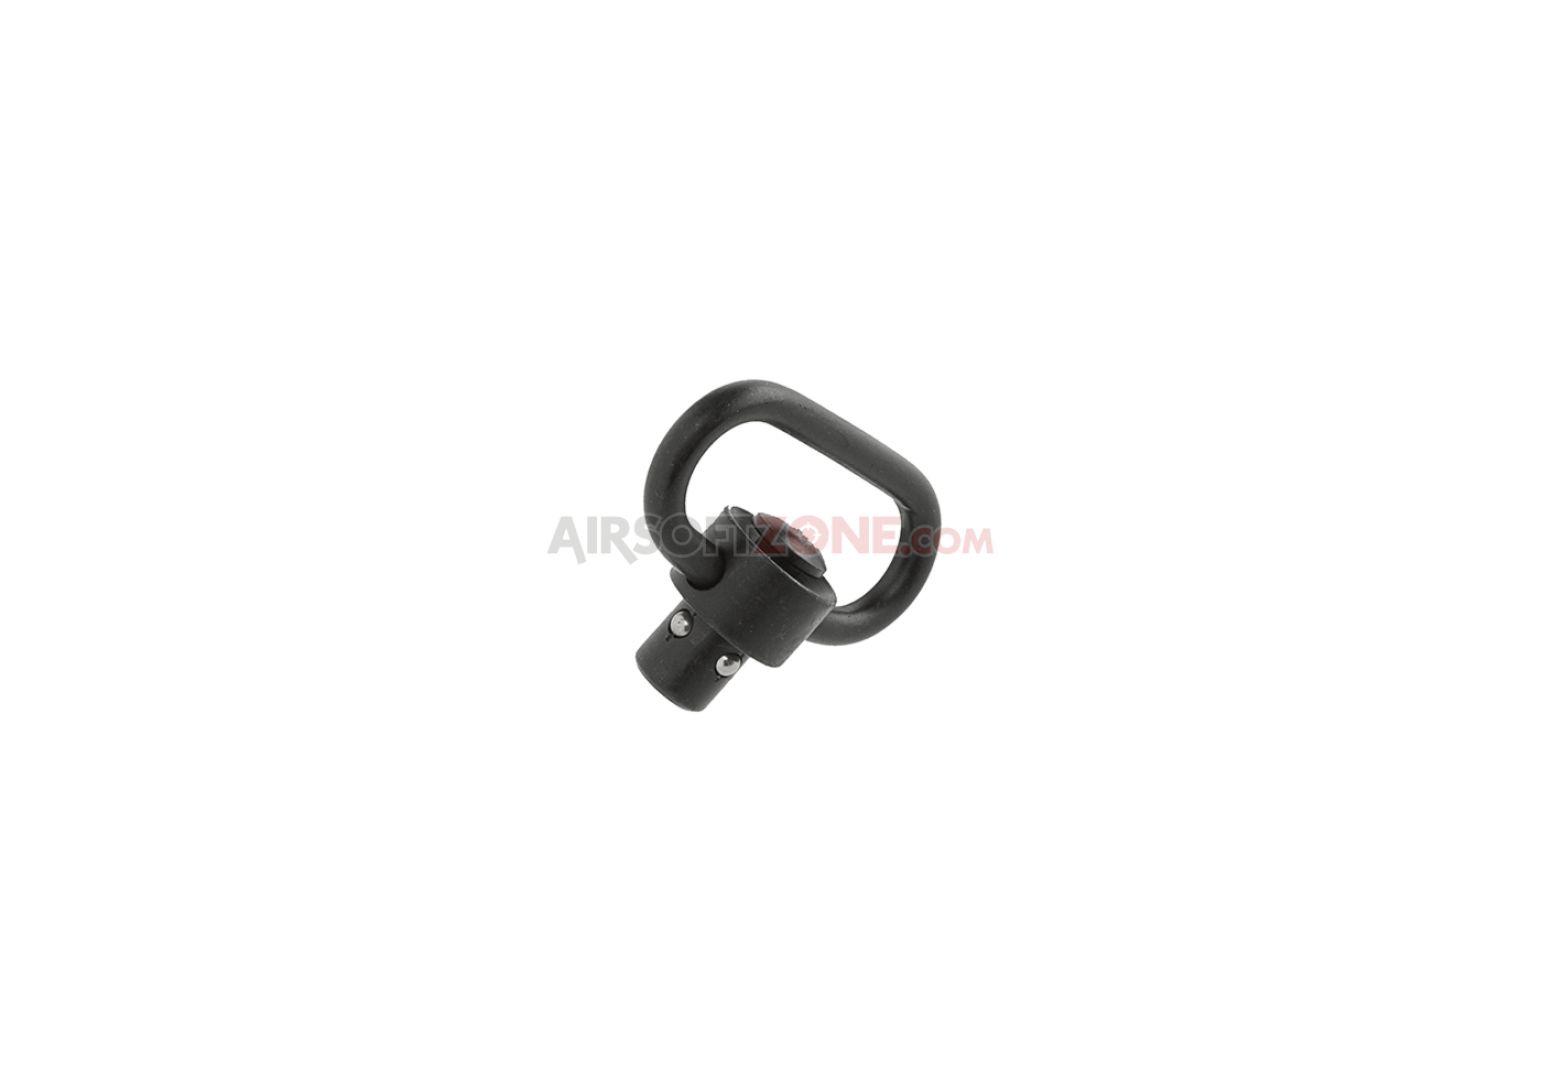 Attacco cinghia sgancio rapido heavy duty push button qd 1,25'' BK